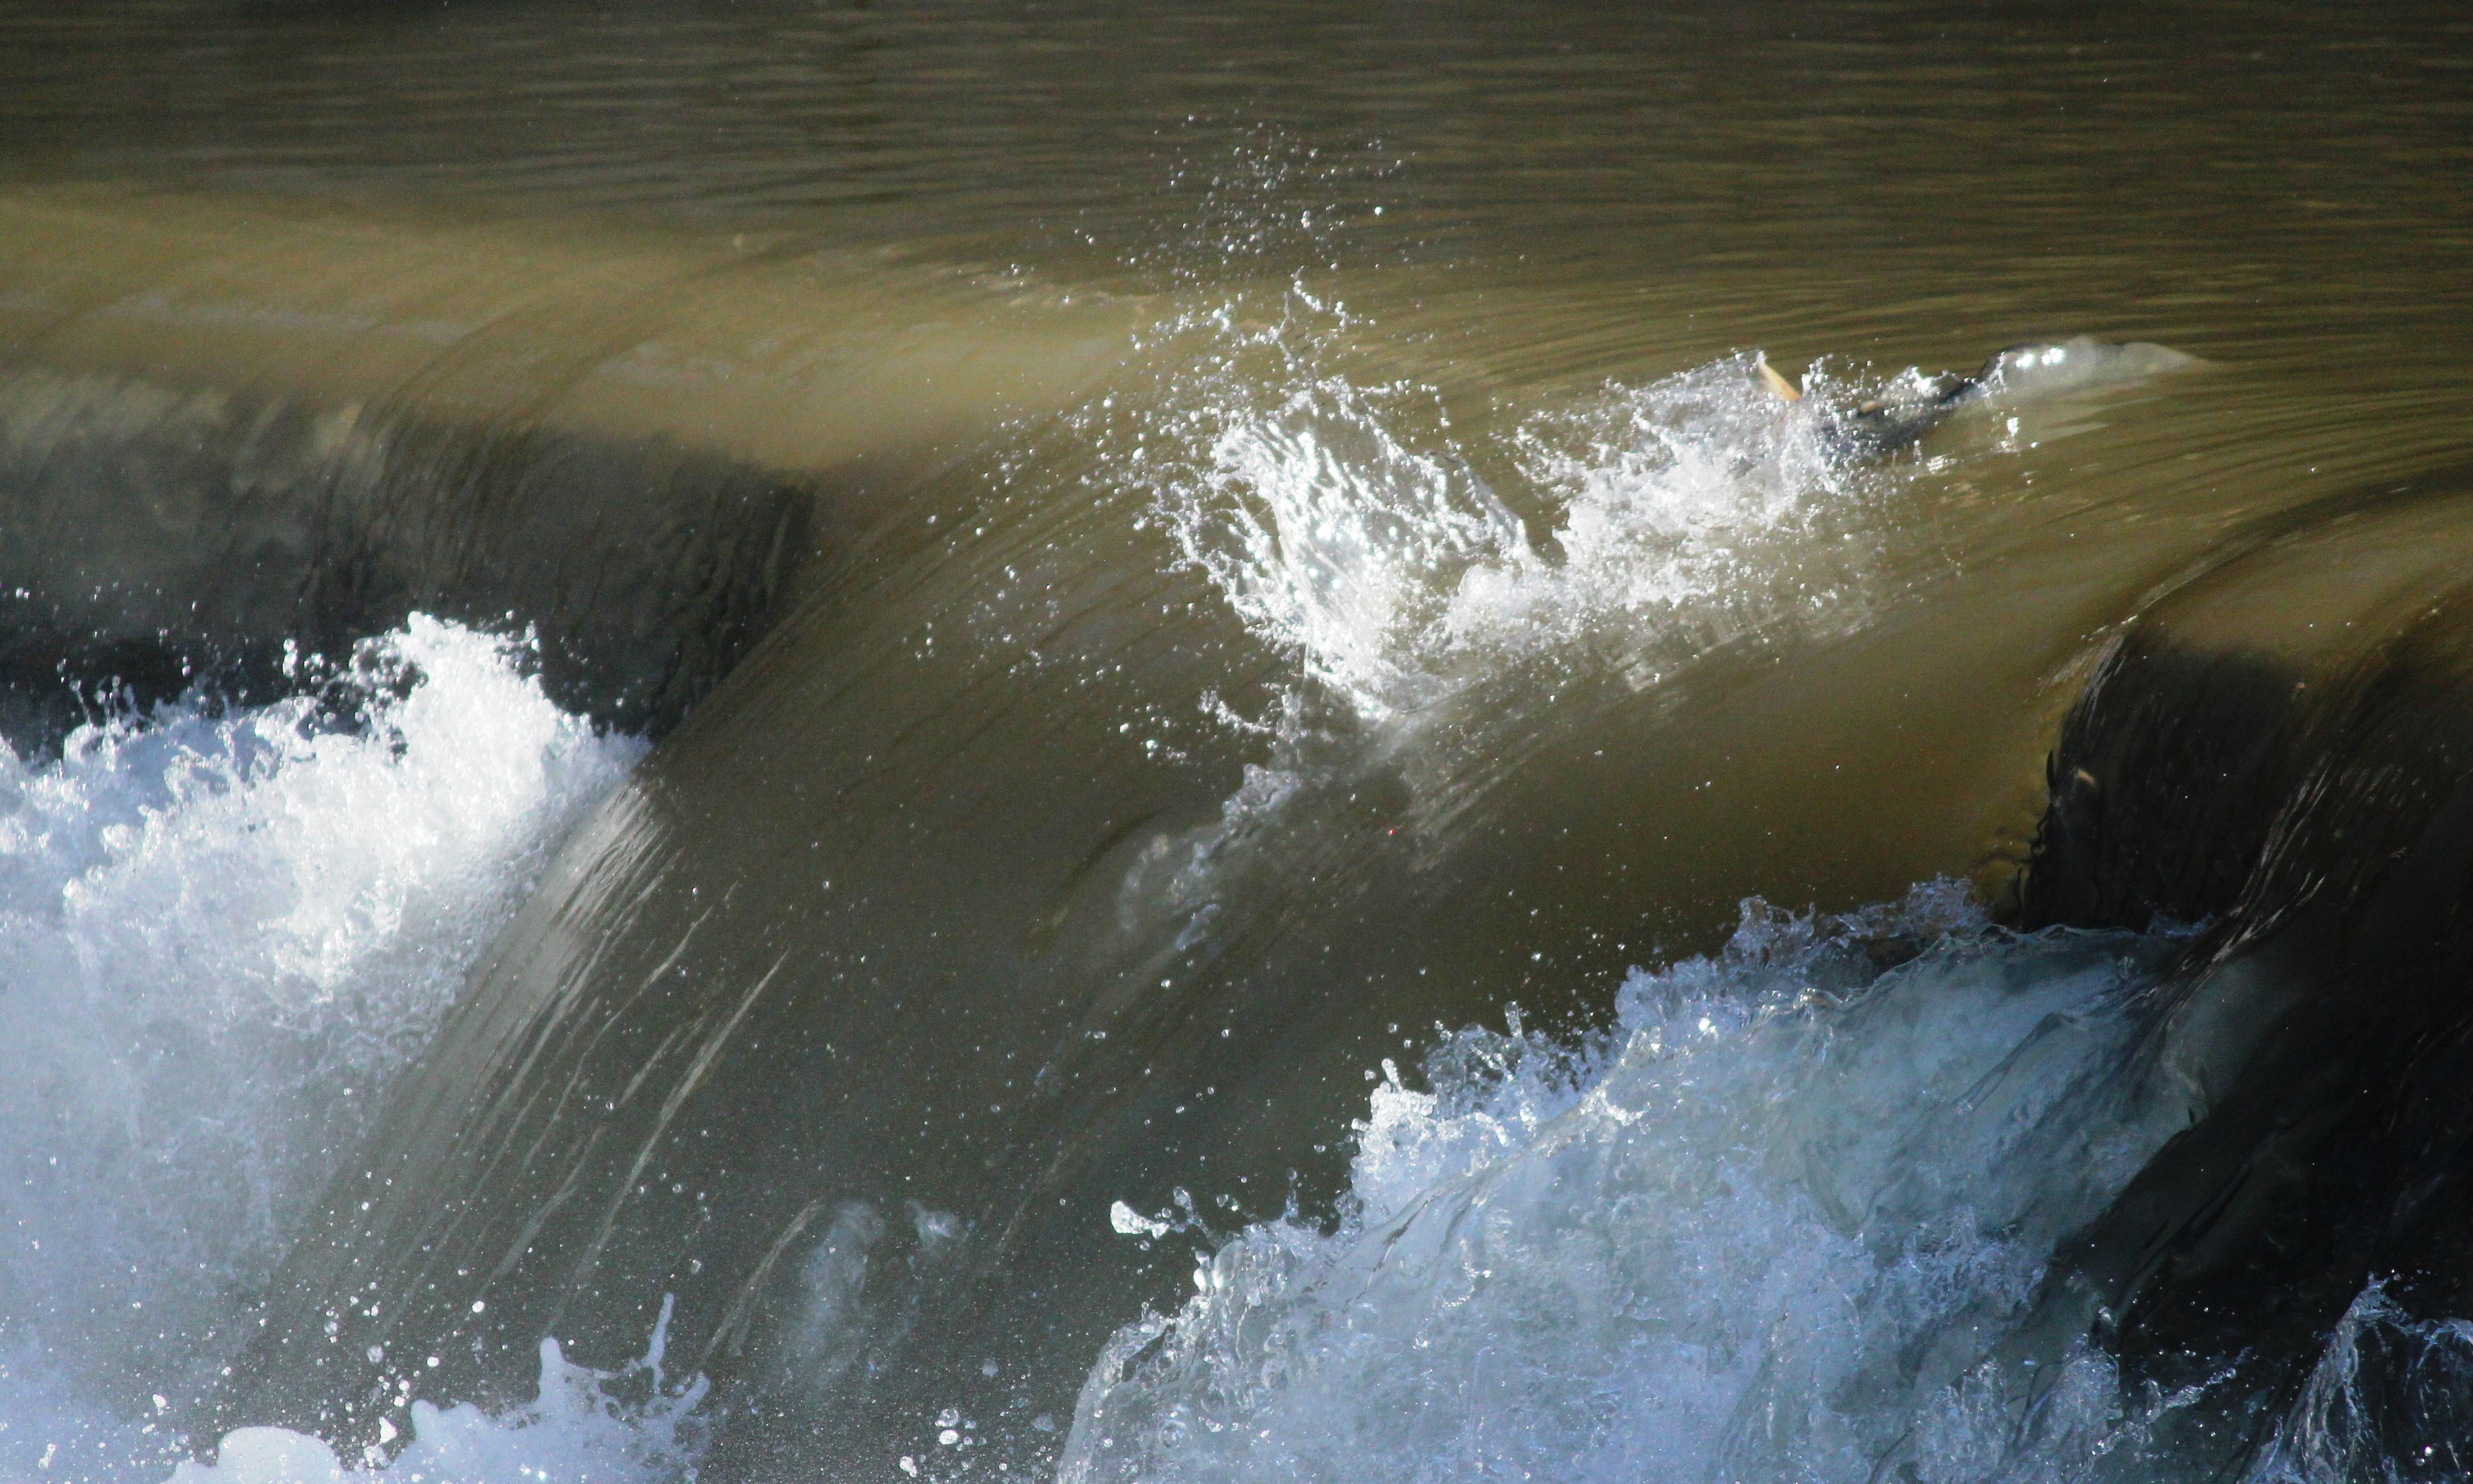 Photograph: A successful trout.